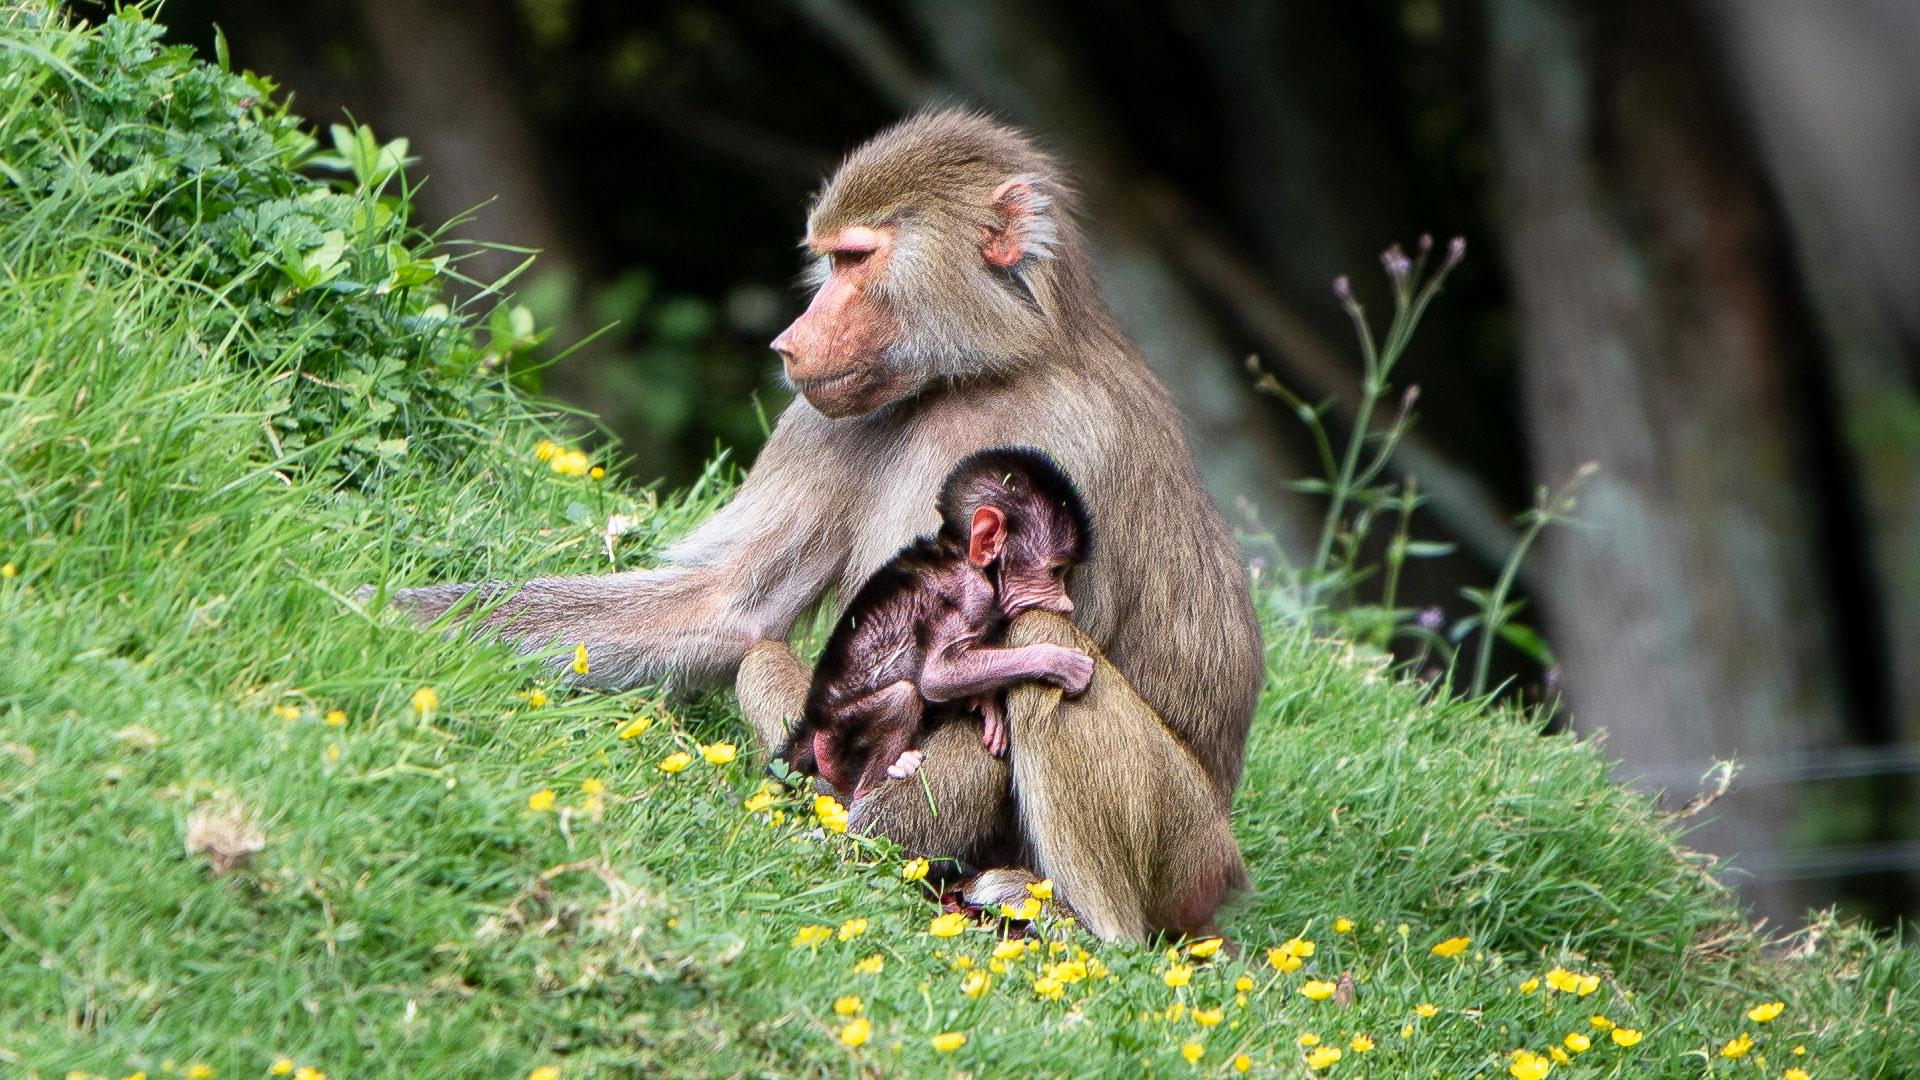 https://rfacdn.nz/zoo/assets/media/baboon-baby-gallery-3.jpg